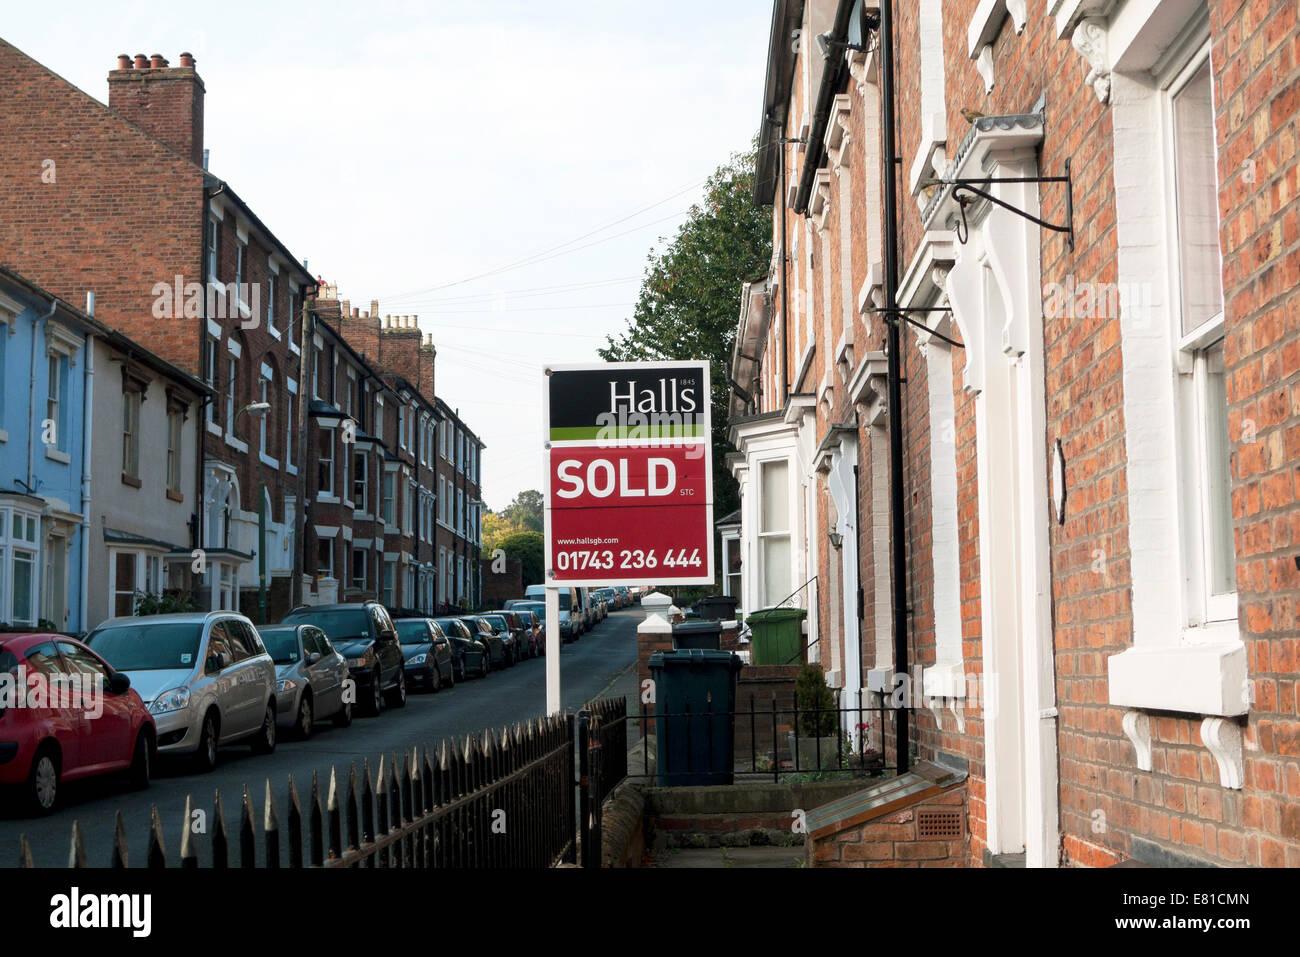 Hall's Estate Agent Sold Sign in Victoria Street Shrewsbury England, UK  KATHY DEWITT - Stock Image